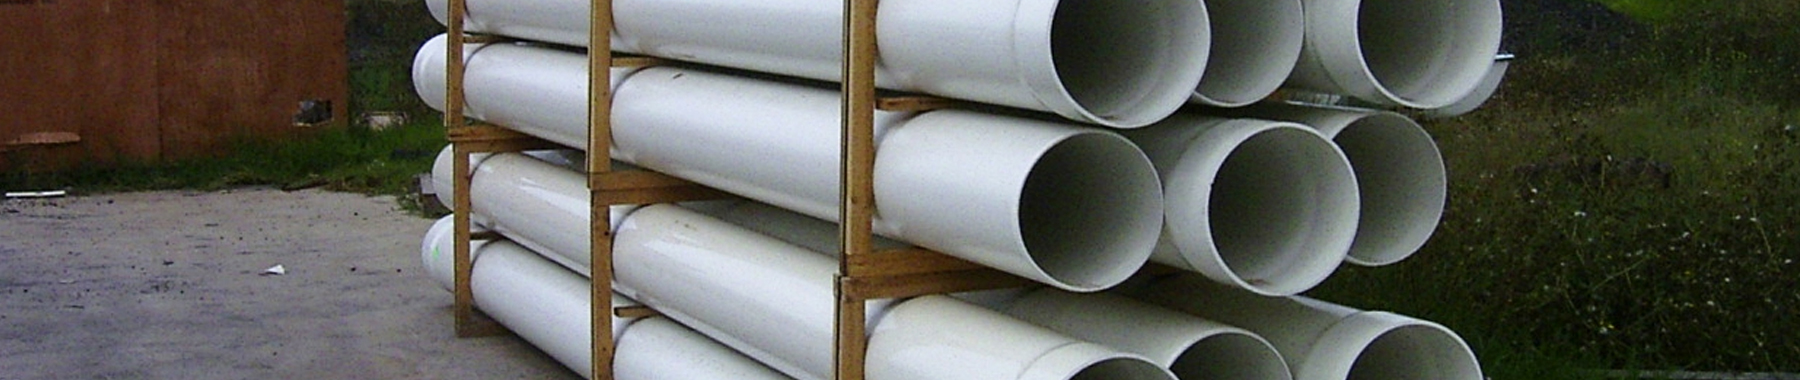 Tubo de acero inoxidable 309 tubo de acero inoxidable - Tubos de acero inoxidable ...